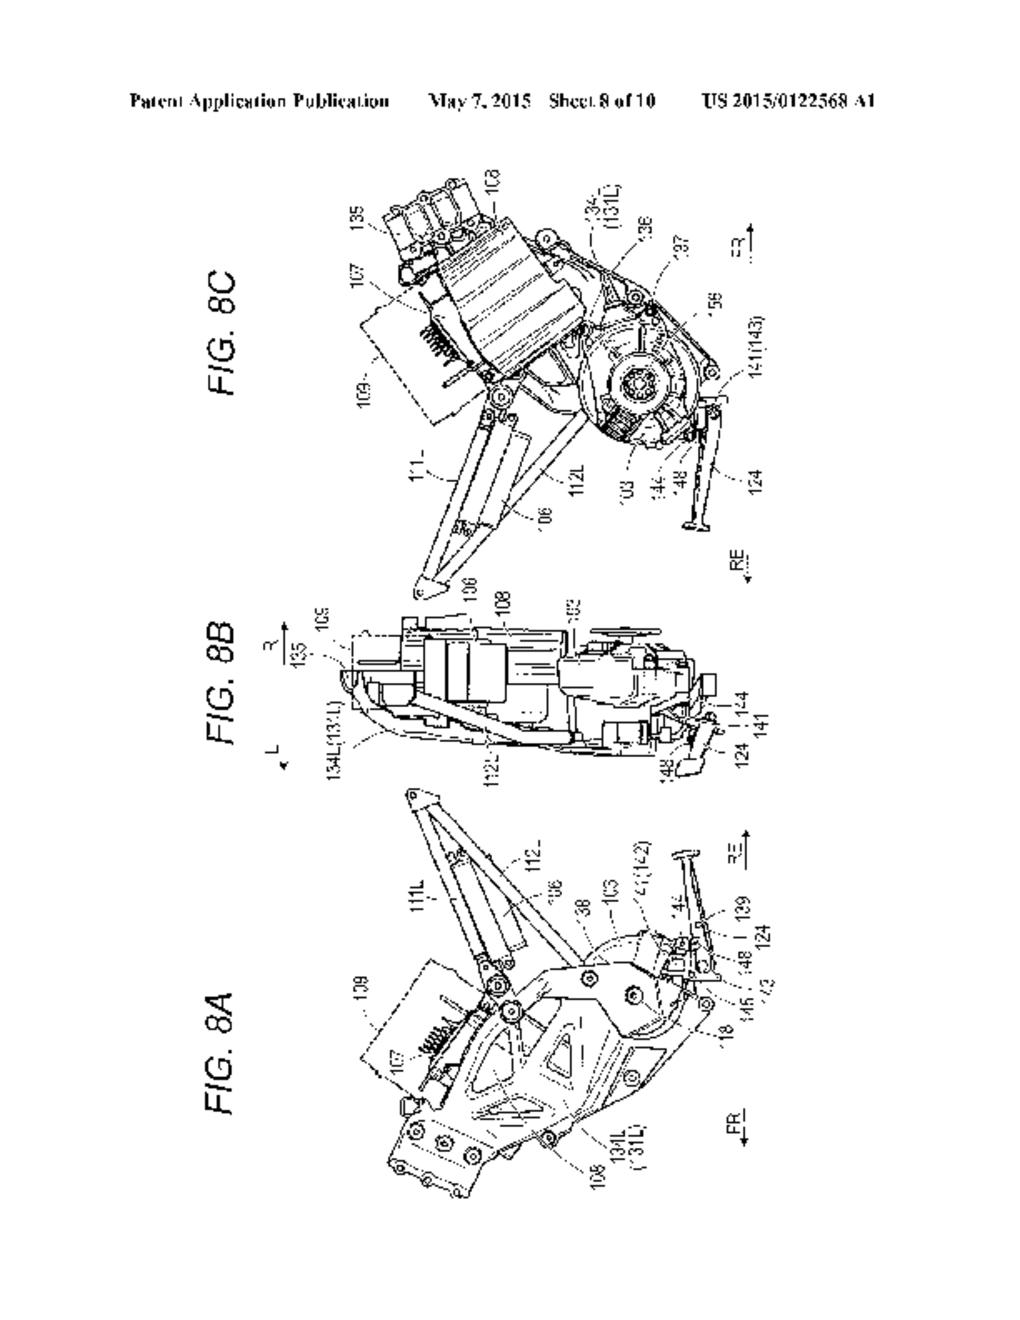 Electric Motorcycle Engine Diagram Taotao Ata 110 Wiring